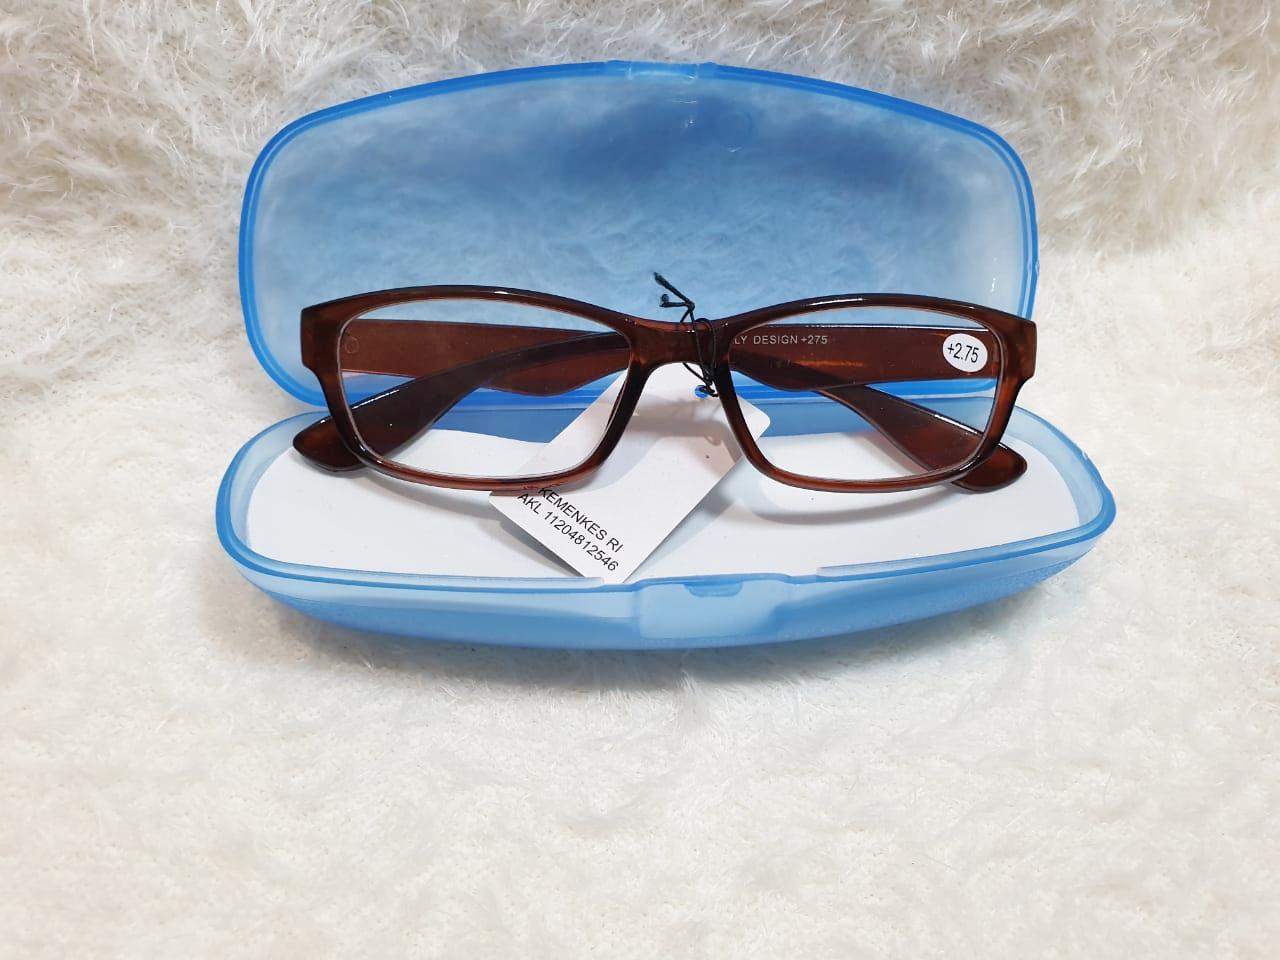 bayar tempat / kaca mata wanita coklat impor/ kaca mata pria gaya model trendy / kacamata baca plus / kacamata plus pria / free case / best er / jkt hijab grosir